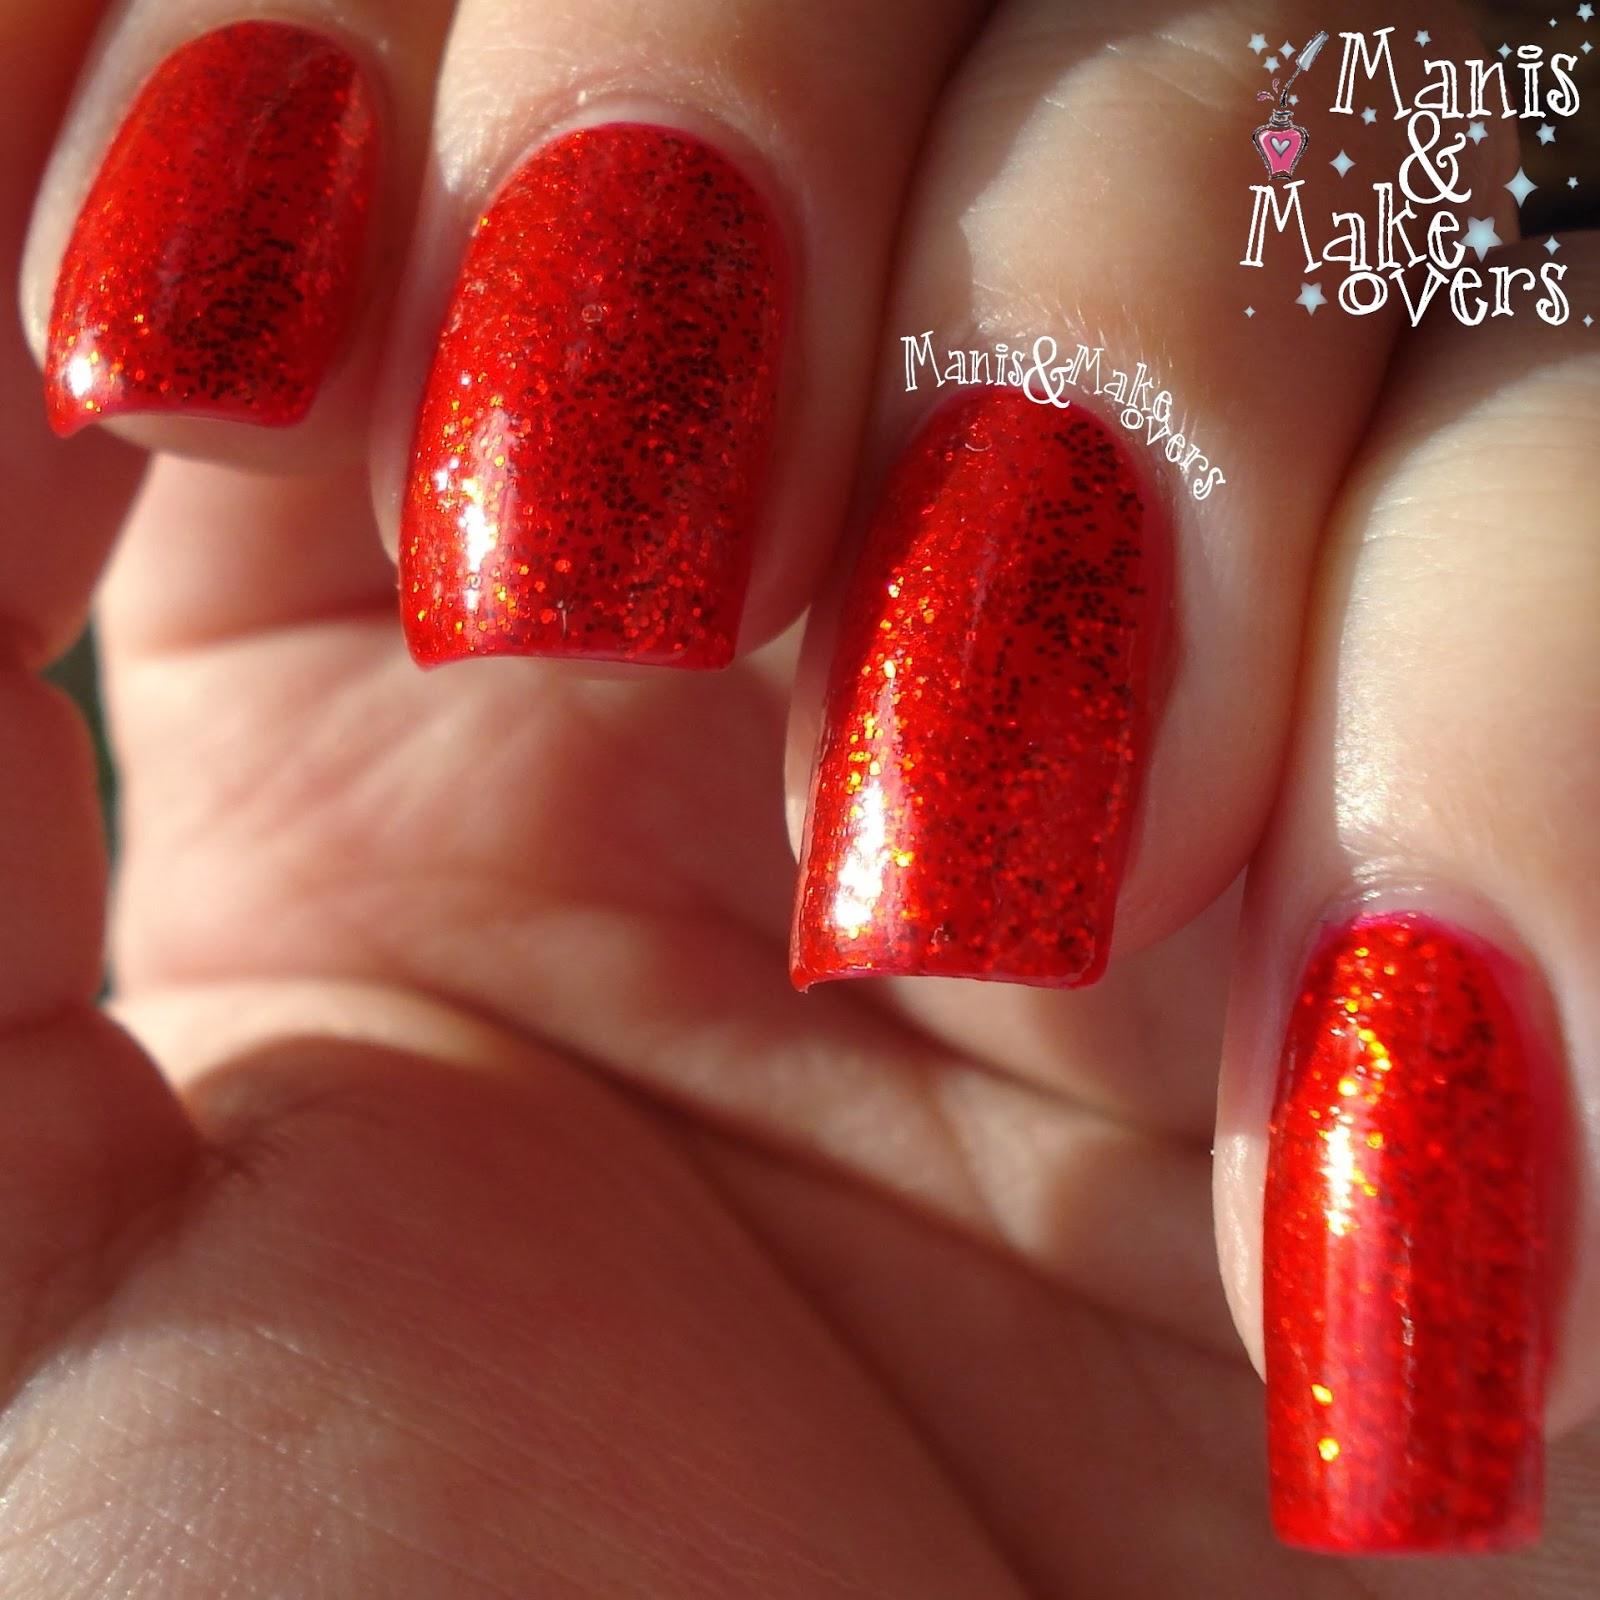 Manis & Makeovers: Xmas polish: W7 Red Dazzle